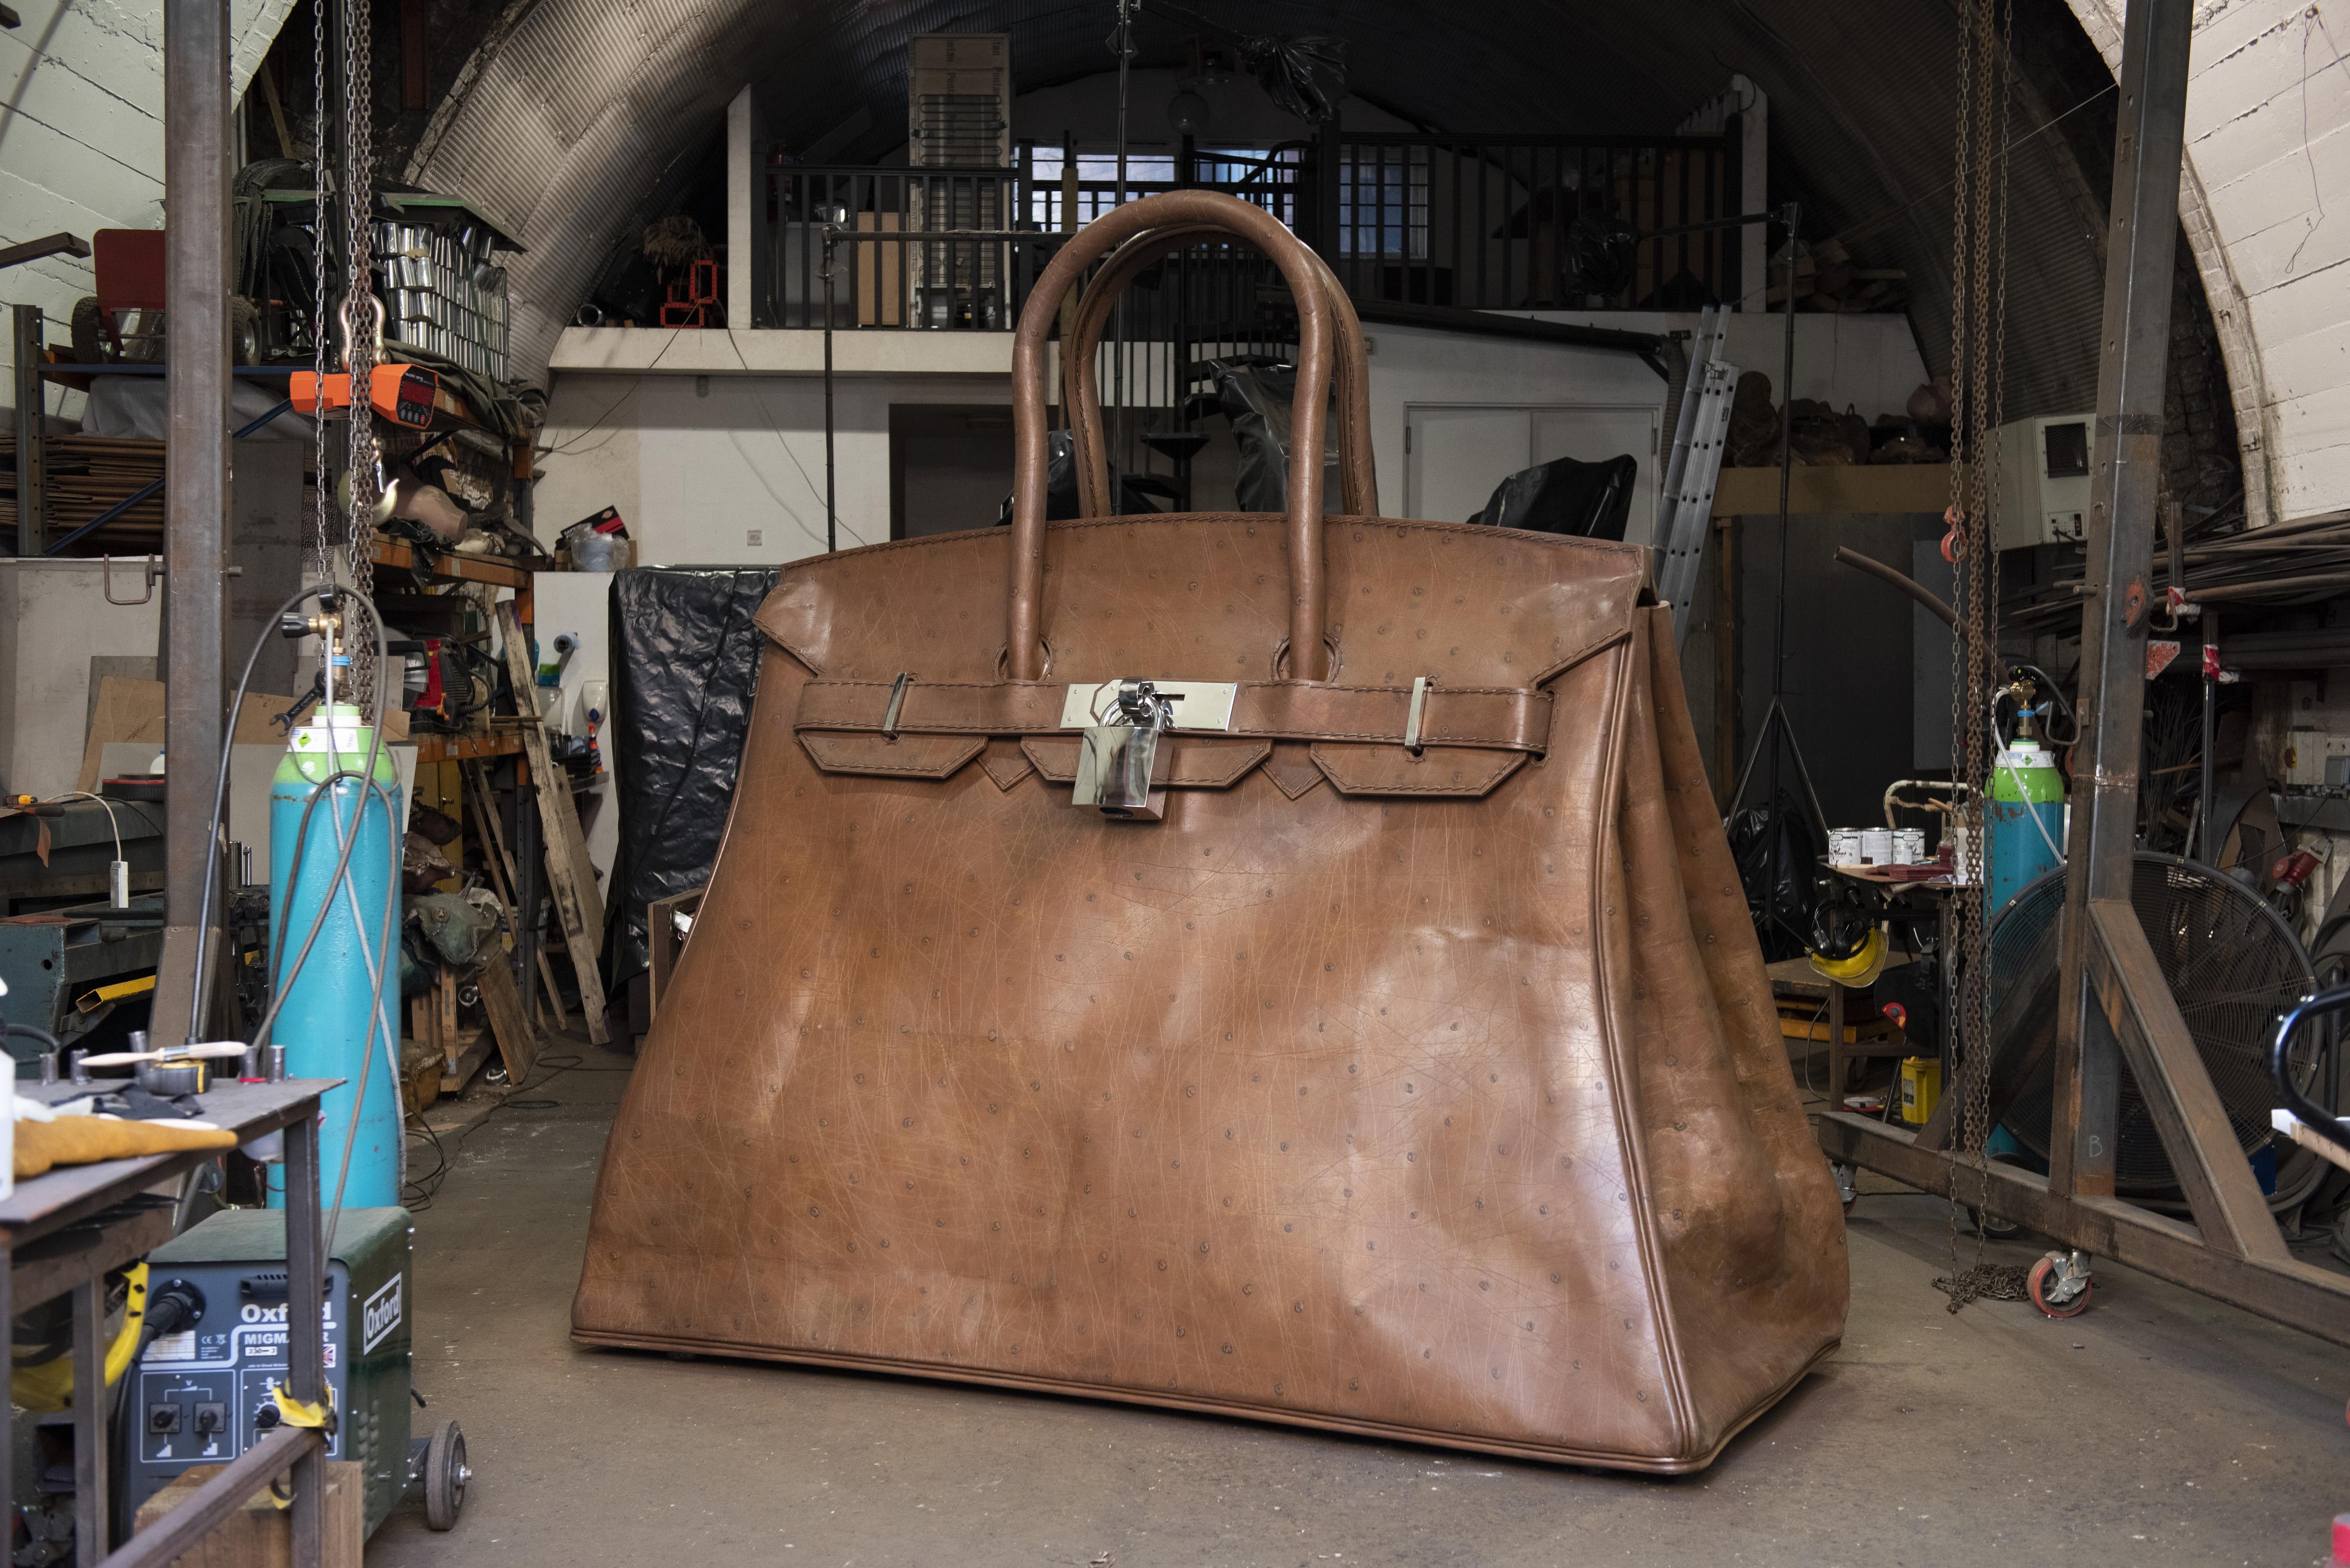 Bag of Aspirations sculpture by Kalliopi Lemos